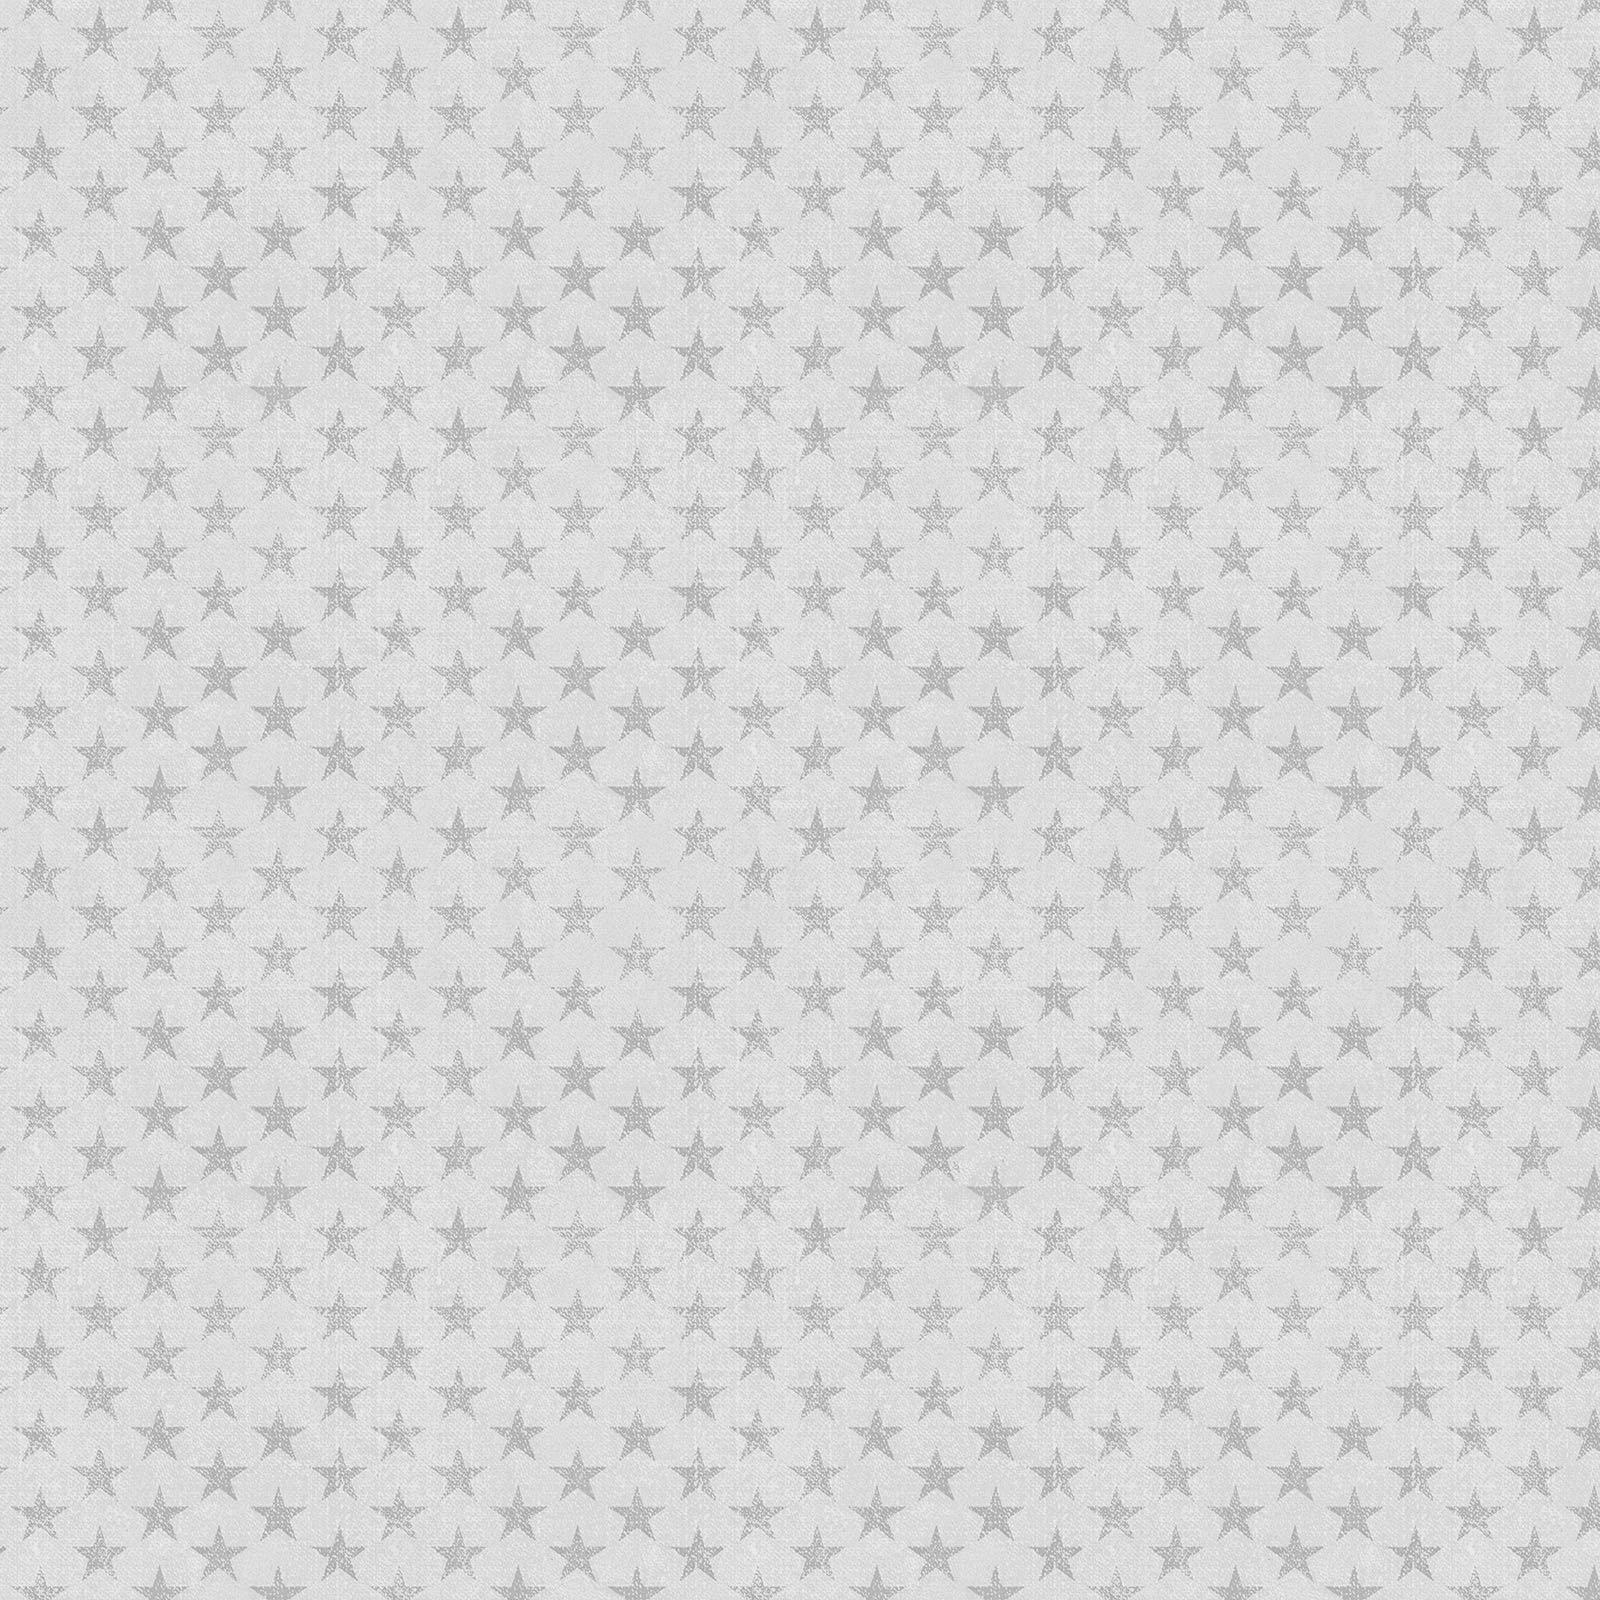 Light Grey Tonal Stars - American Rustic - BEN6336-08